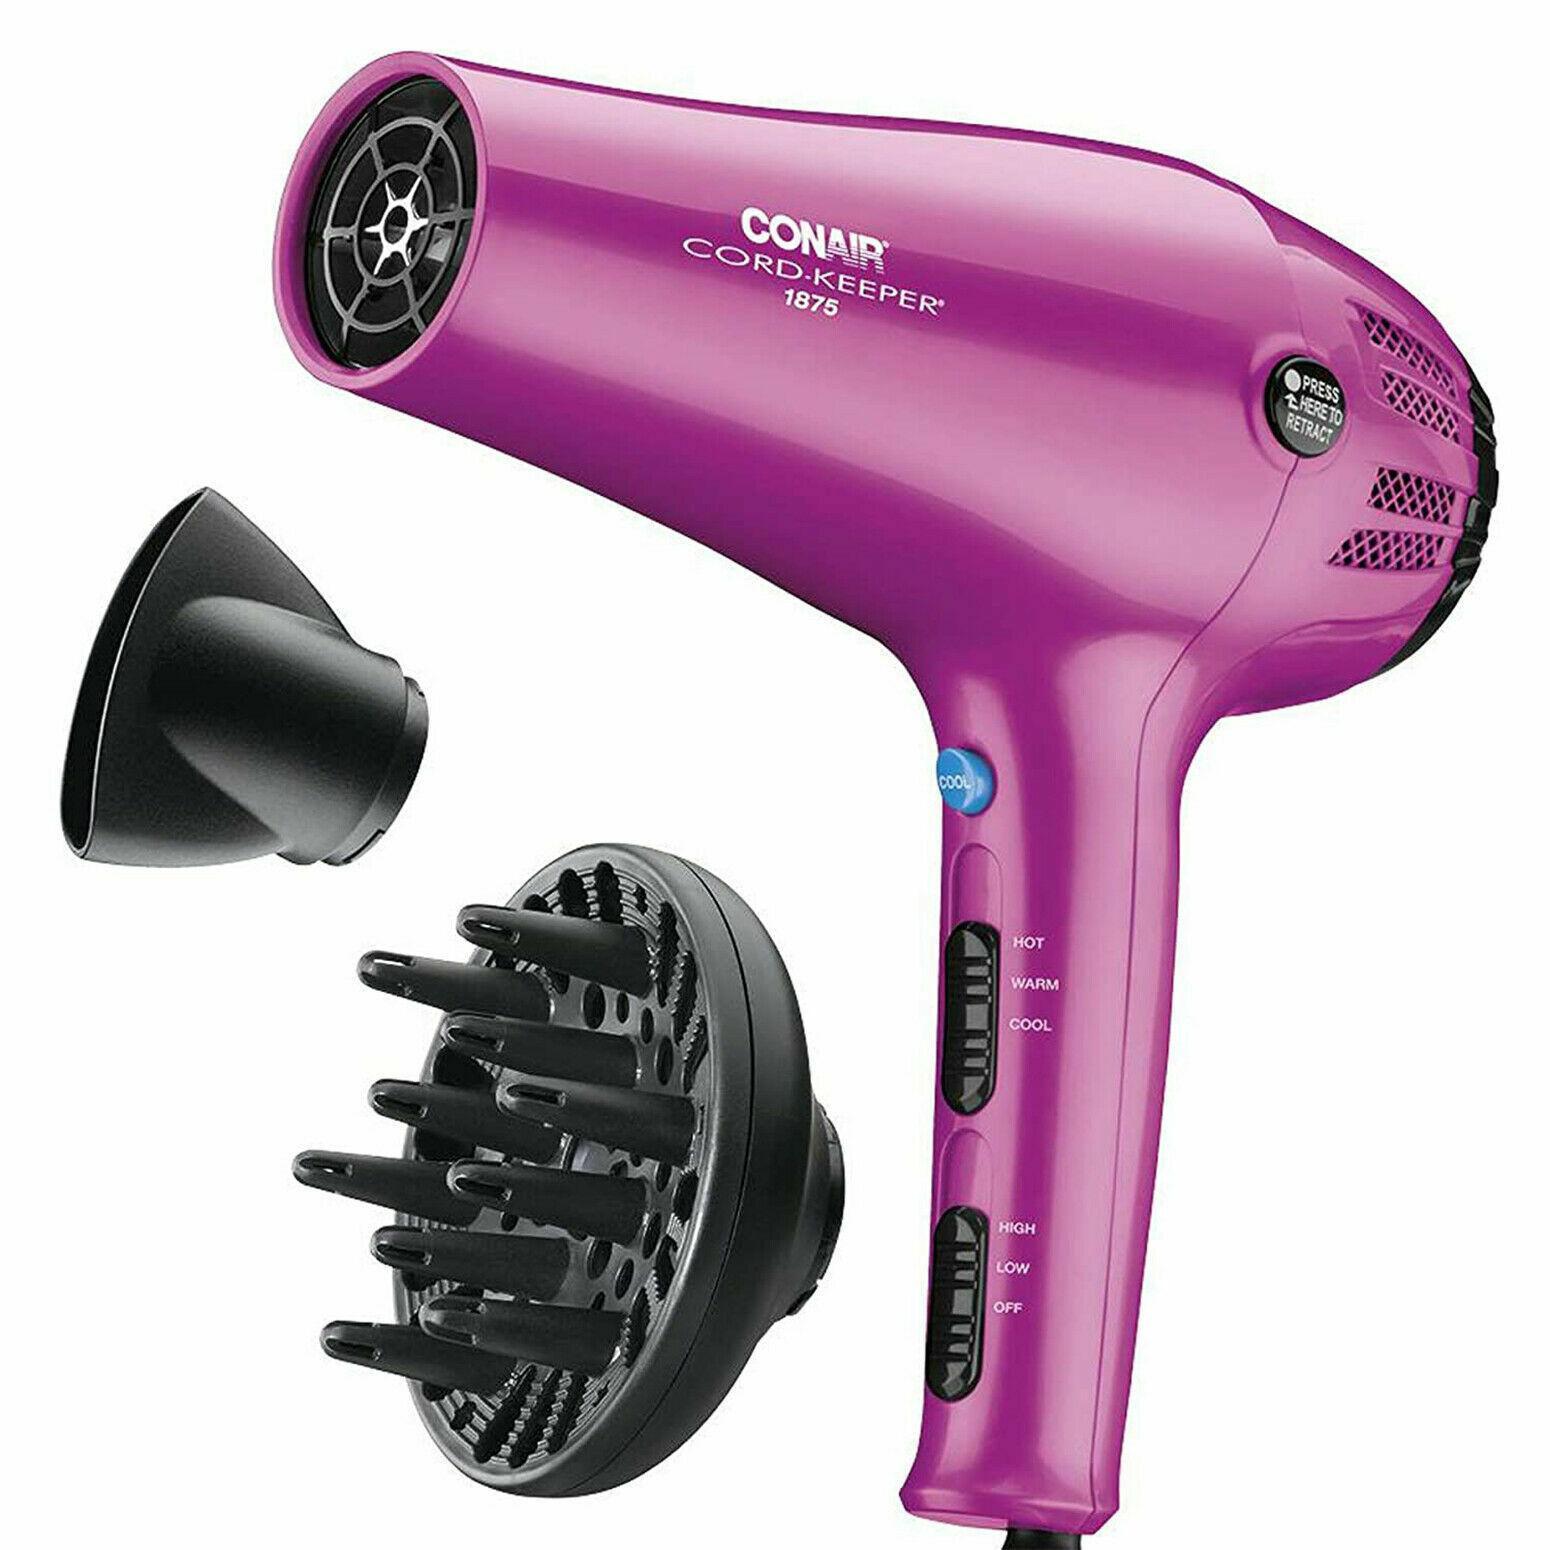 CONAIR HAIR DRYER IONC CRD KPR 209P